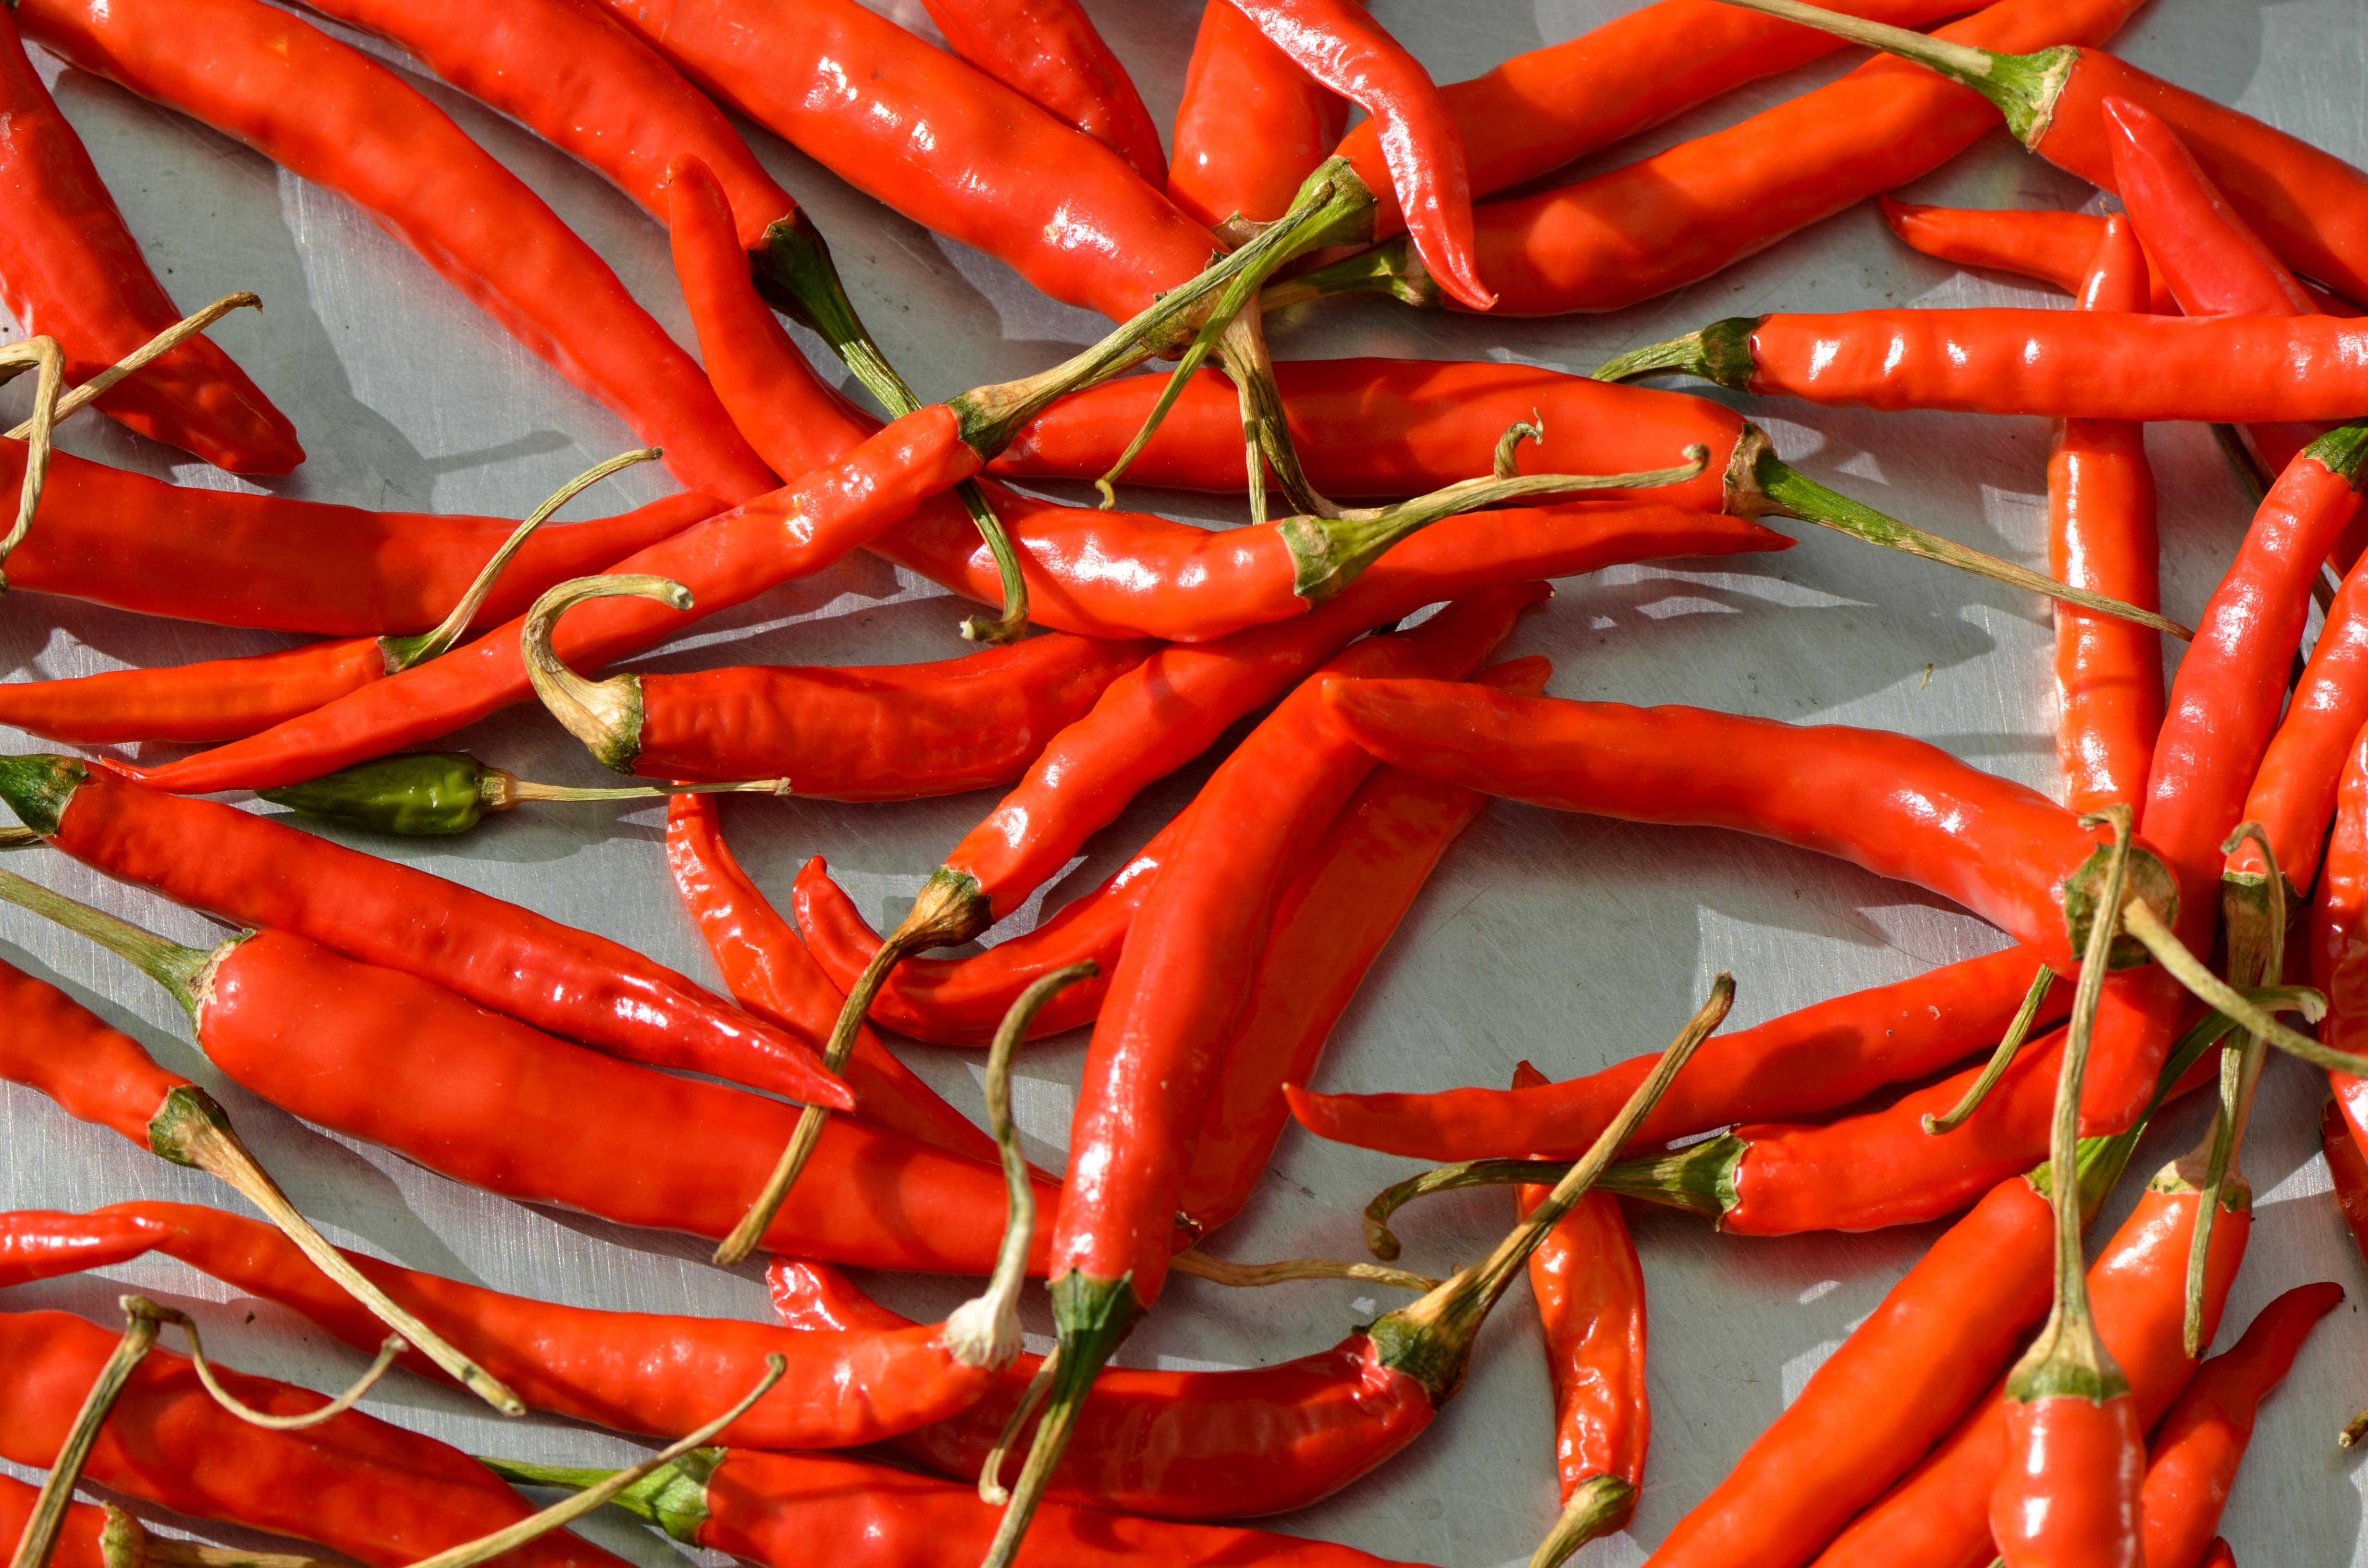 File:Capsicum - red chili chilli - piment rouge - roter